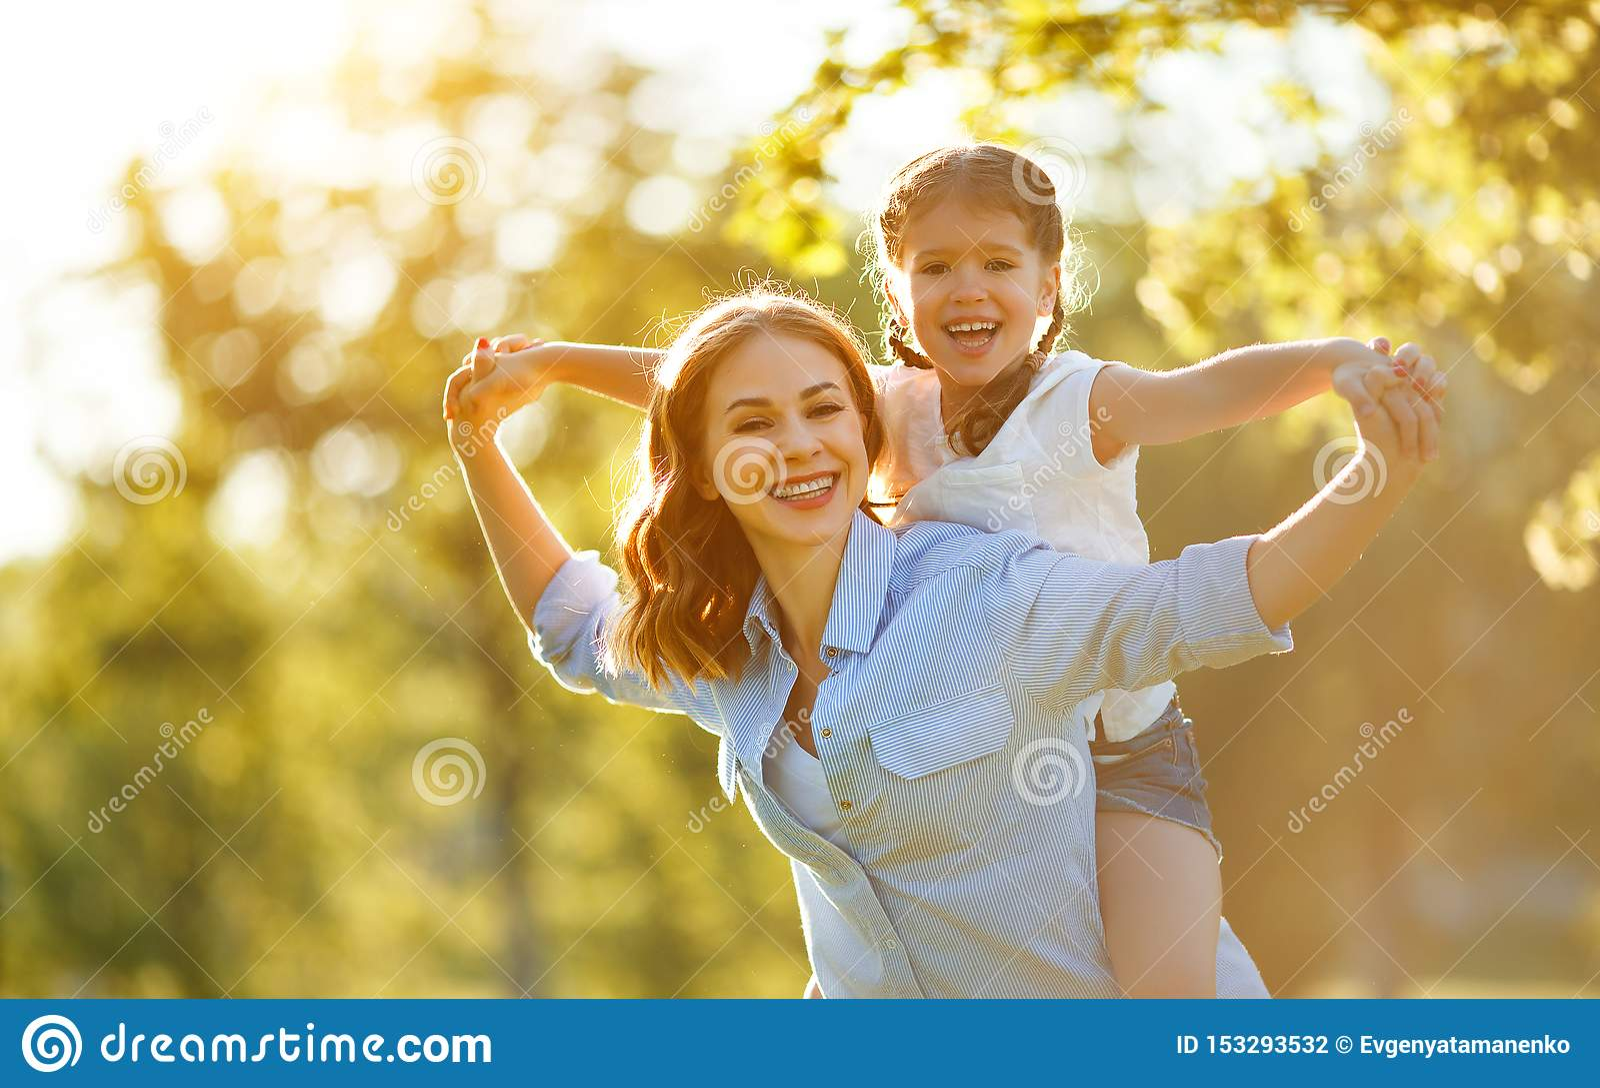 Gelukkige familiemoeder en kinddochter in aard in de zomer